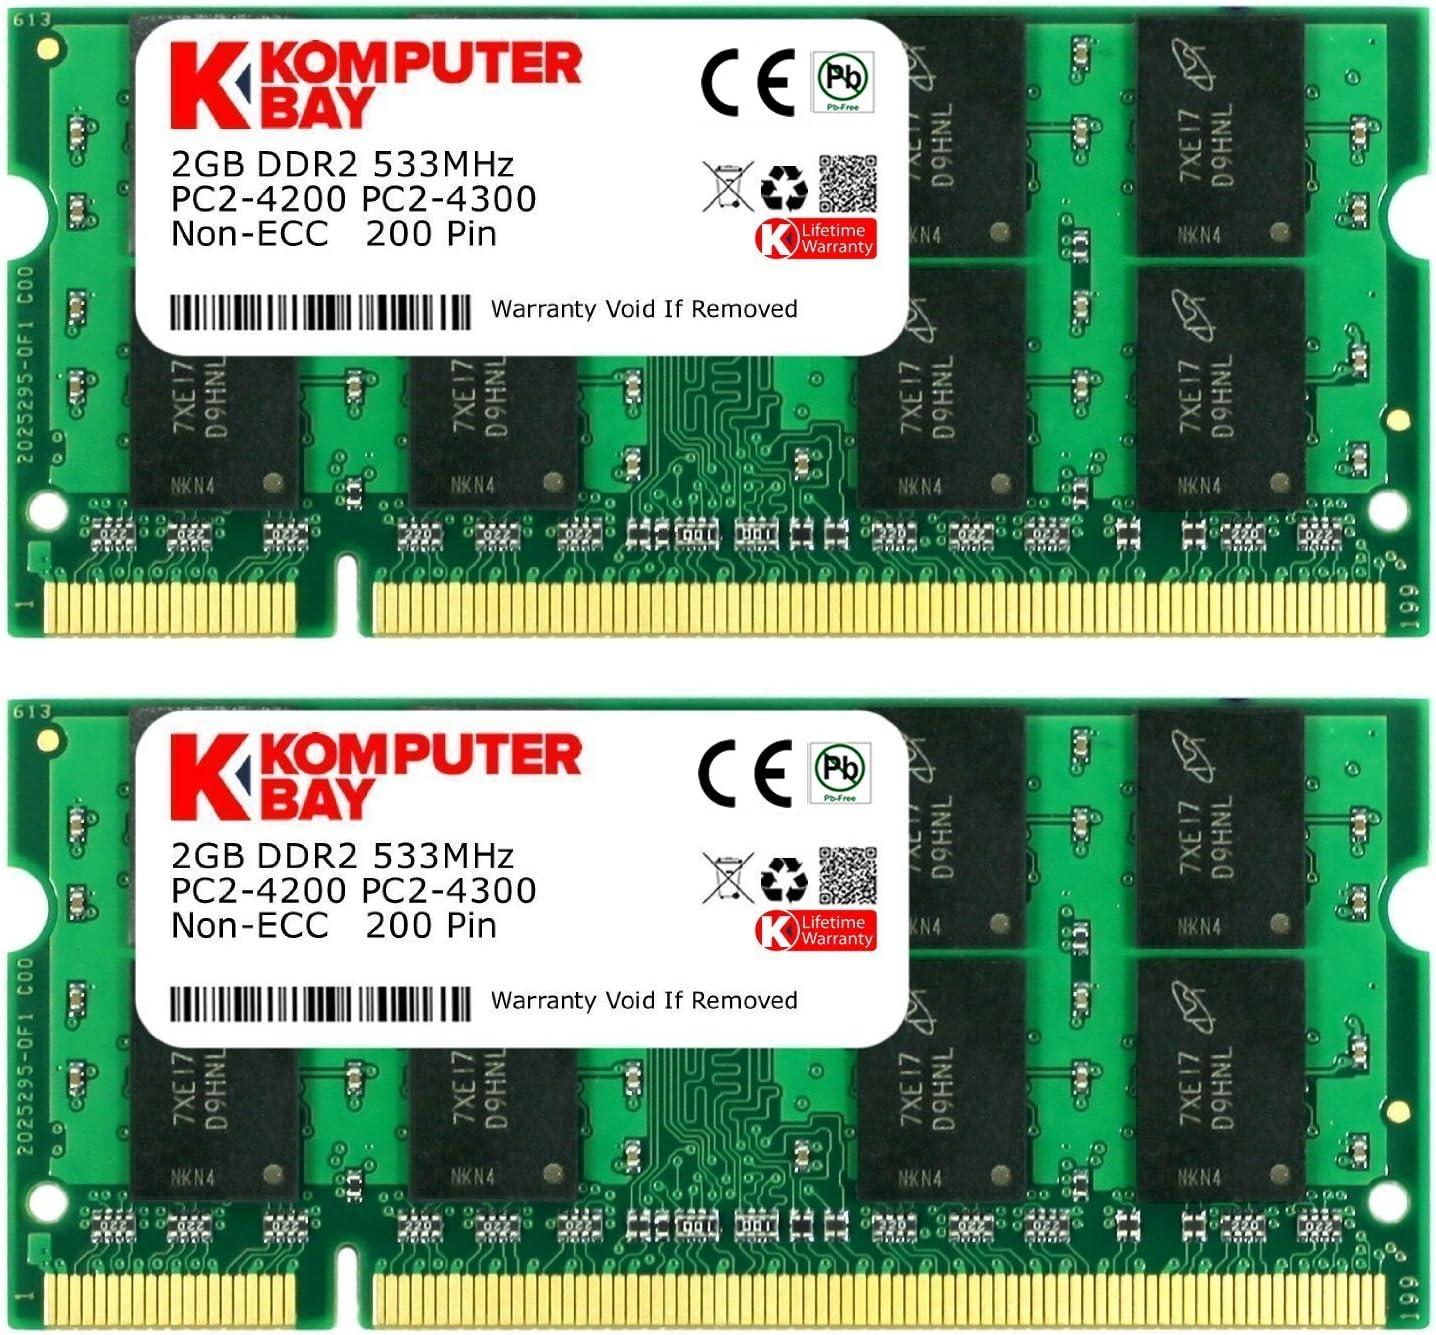 D DUOMEIQI 4GB 2X 2GB DDR2 PC2-4200S 533Mhz SODIMM Notebook Laptop Memory RAM